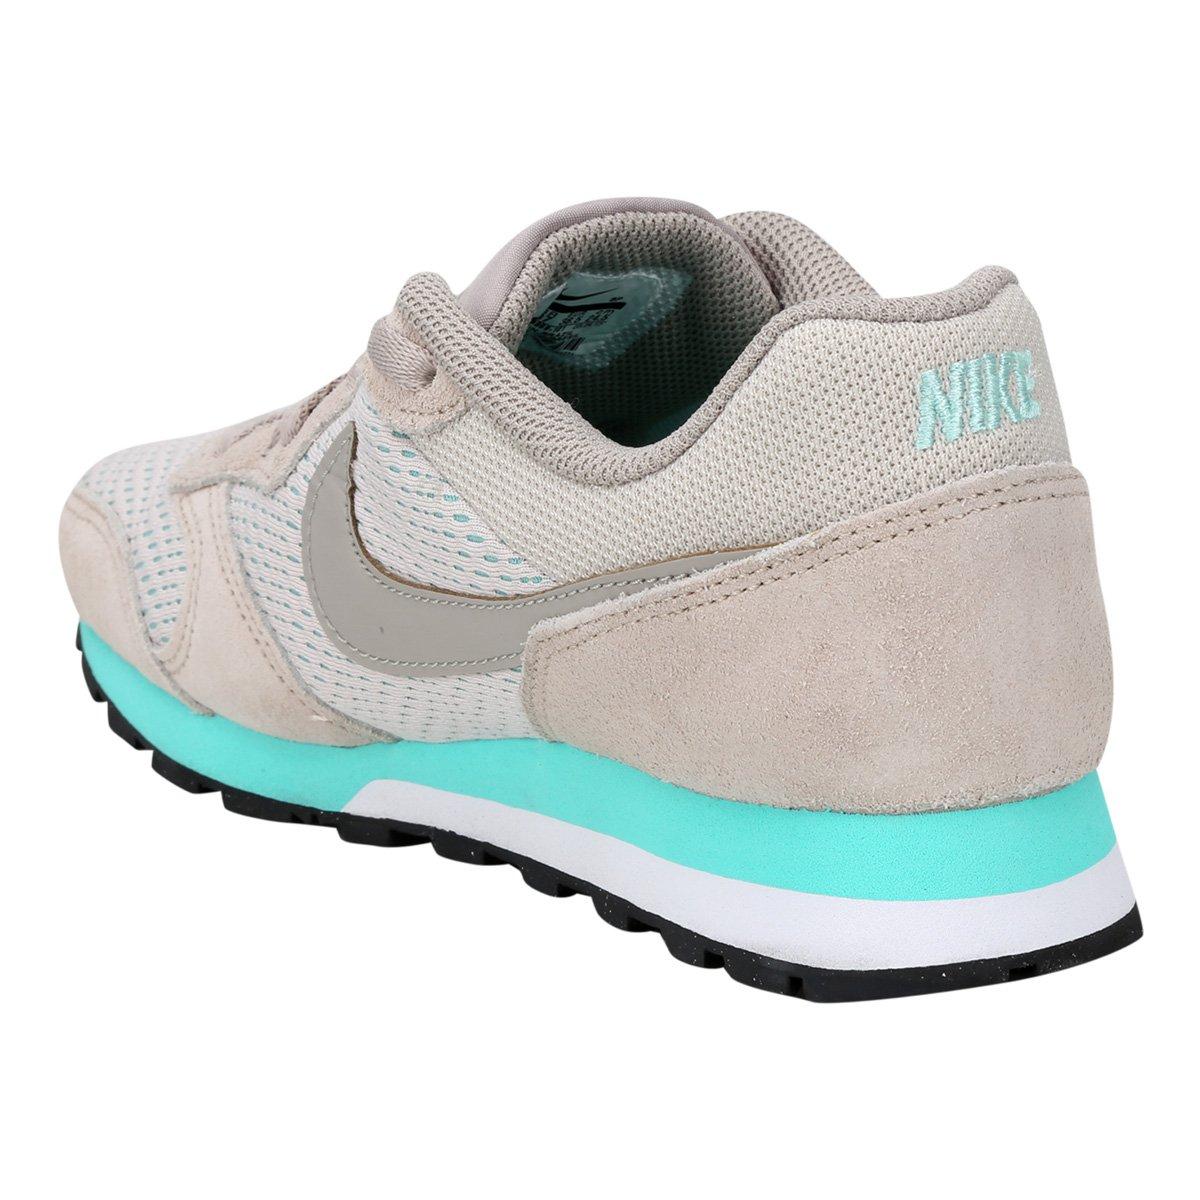 ... Tênis Nike Md Runner 2 Feminino - Cinza e Azul Claro - Compre Agora . f2012353969f4